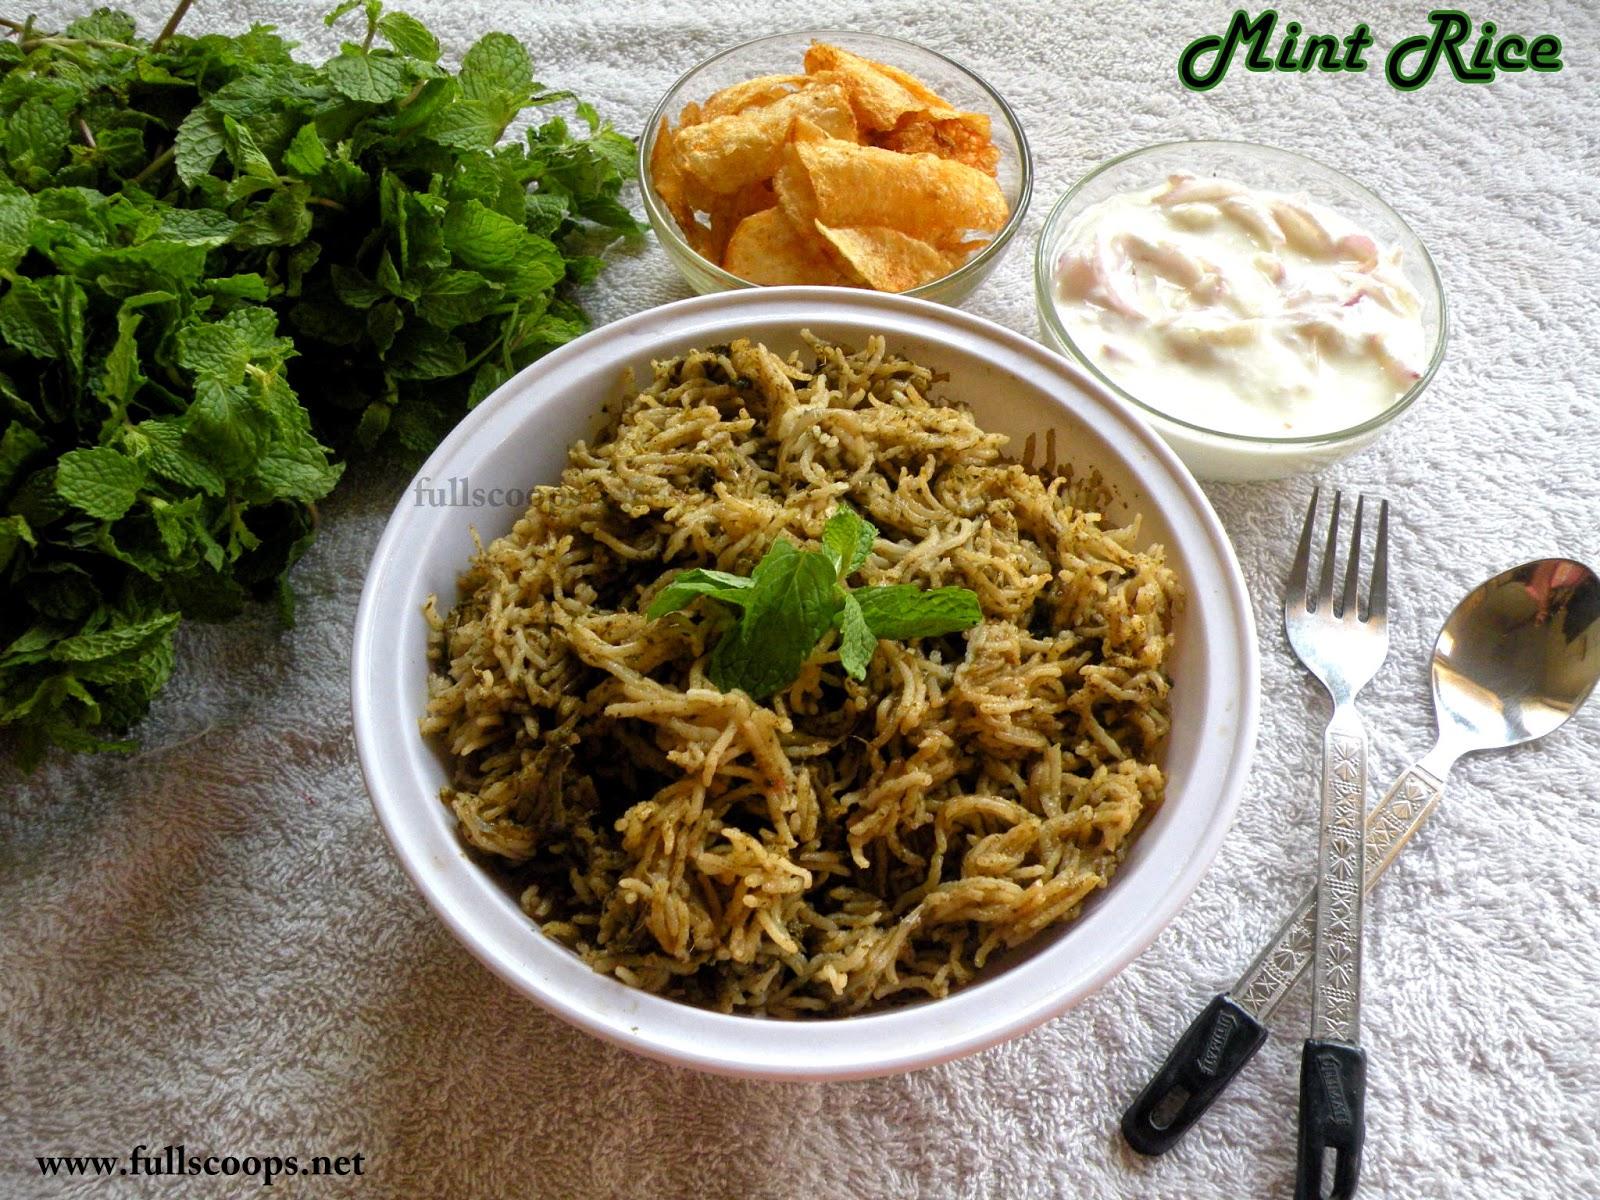 Mint Rice - 2